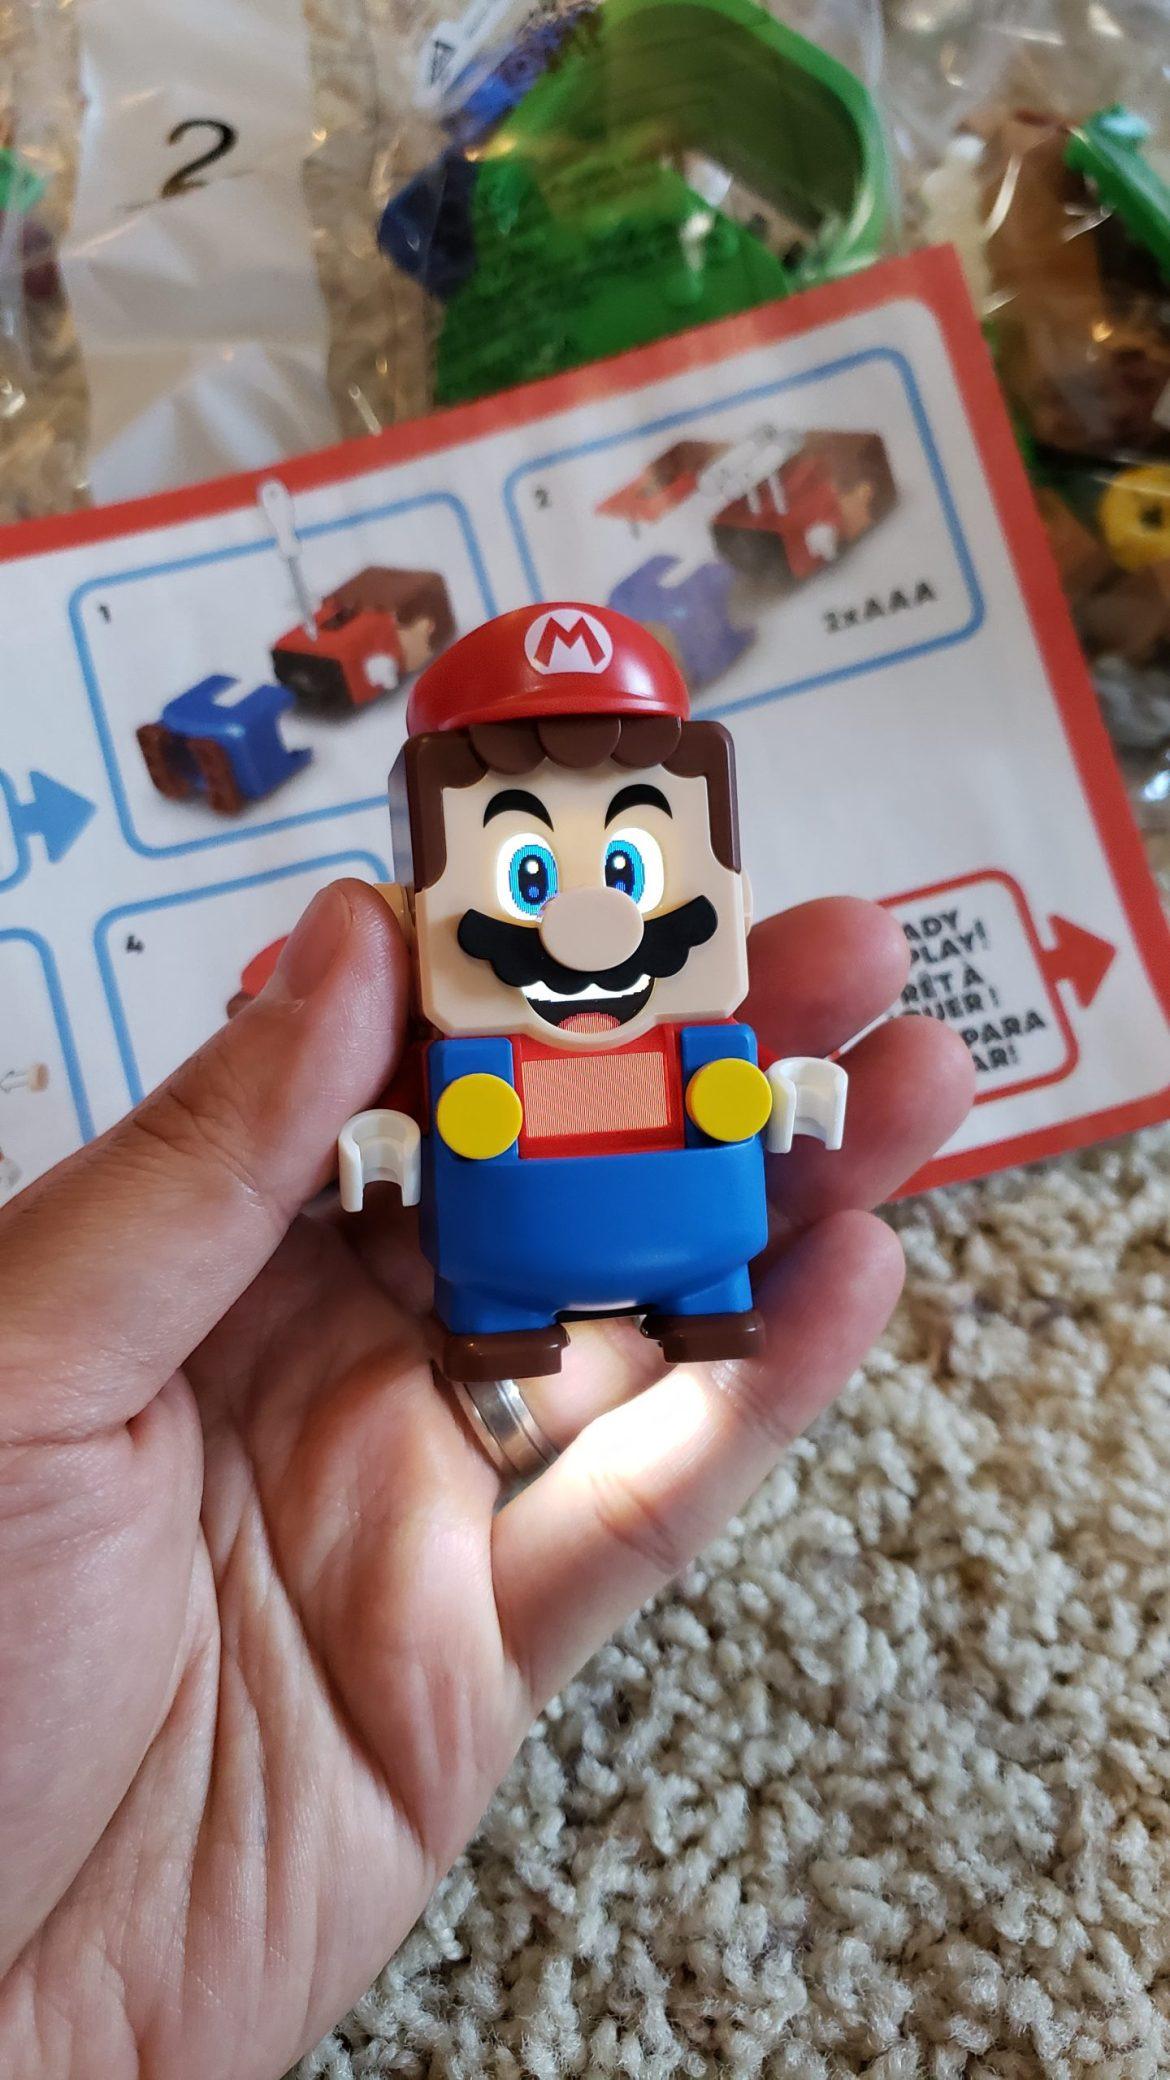 Lego 71360 Super Mario Review- Part 1